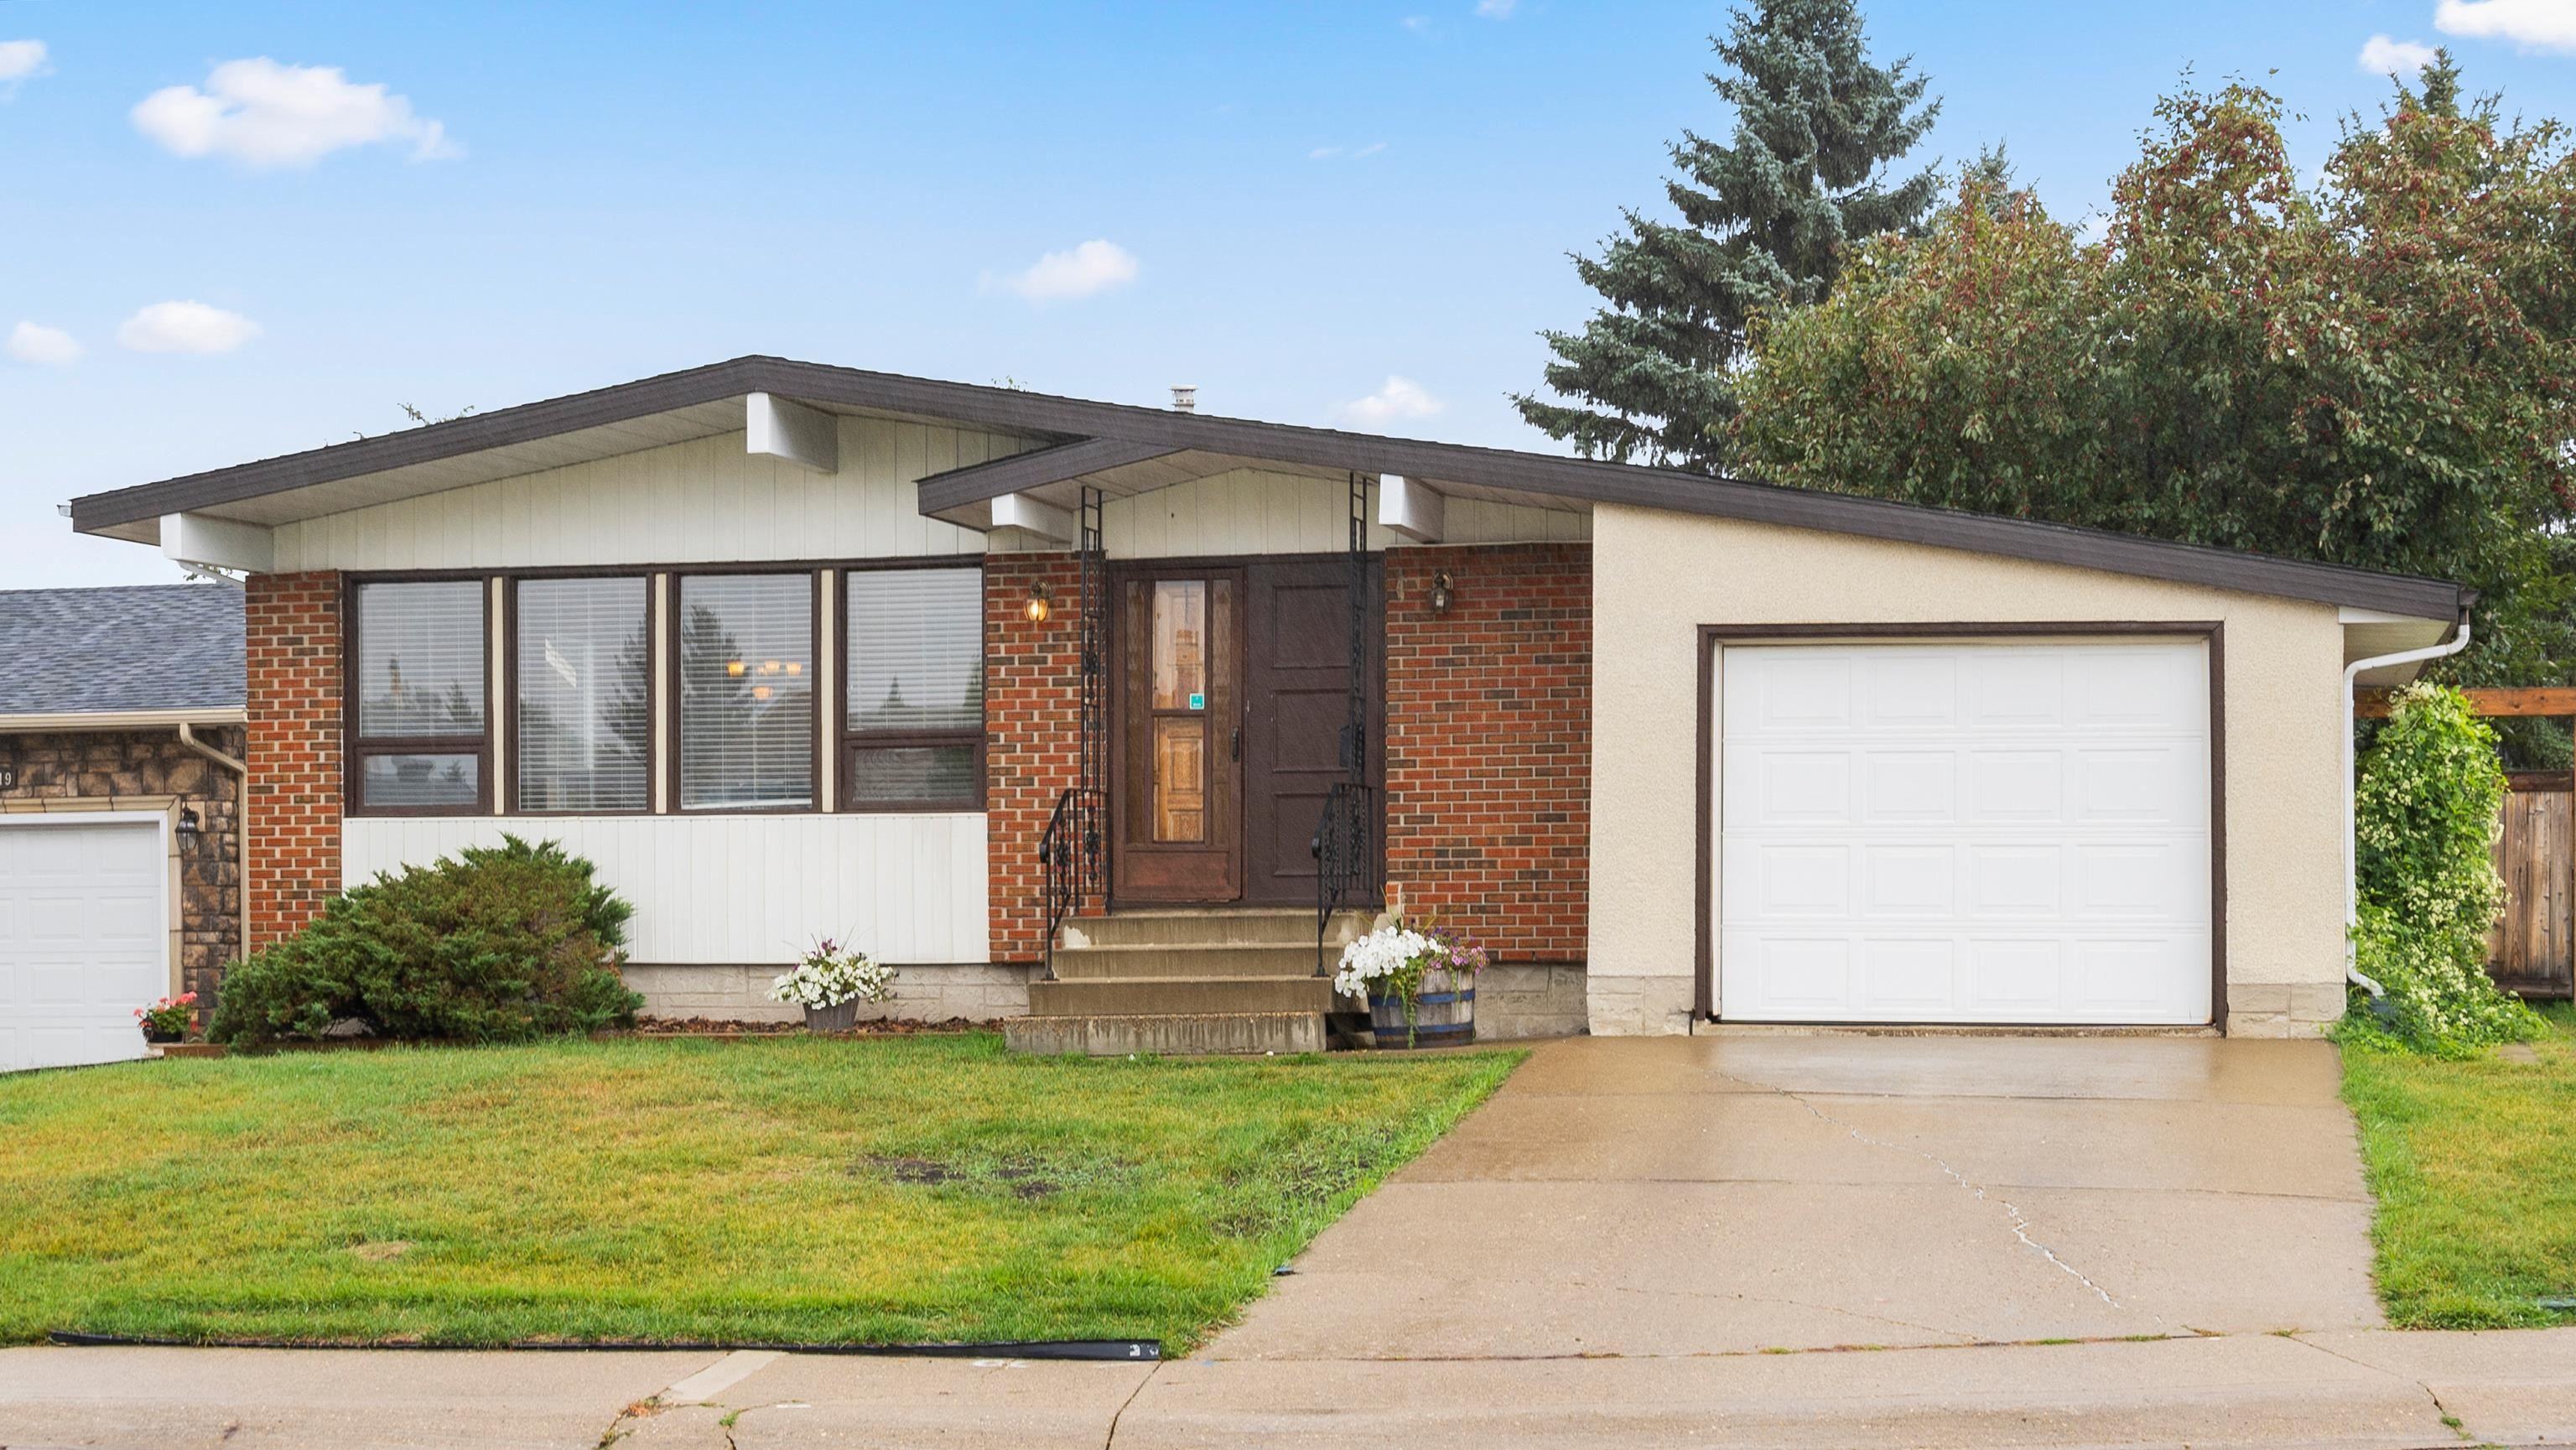 Main Photo: 15015 115 Street in Edmonton: Zone 27 House for sale : MLS®# E4261426